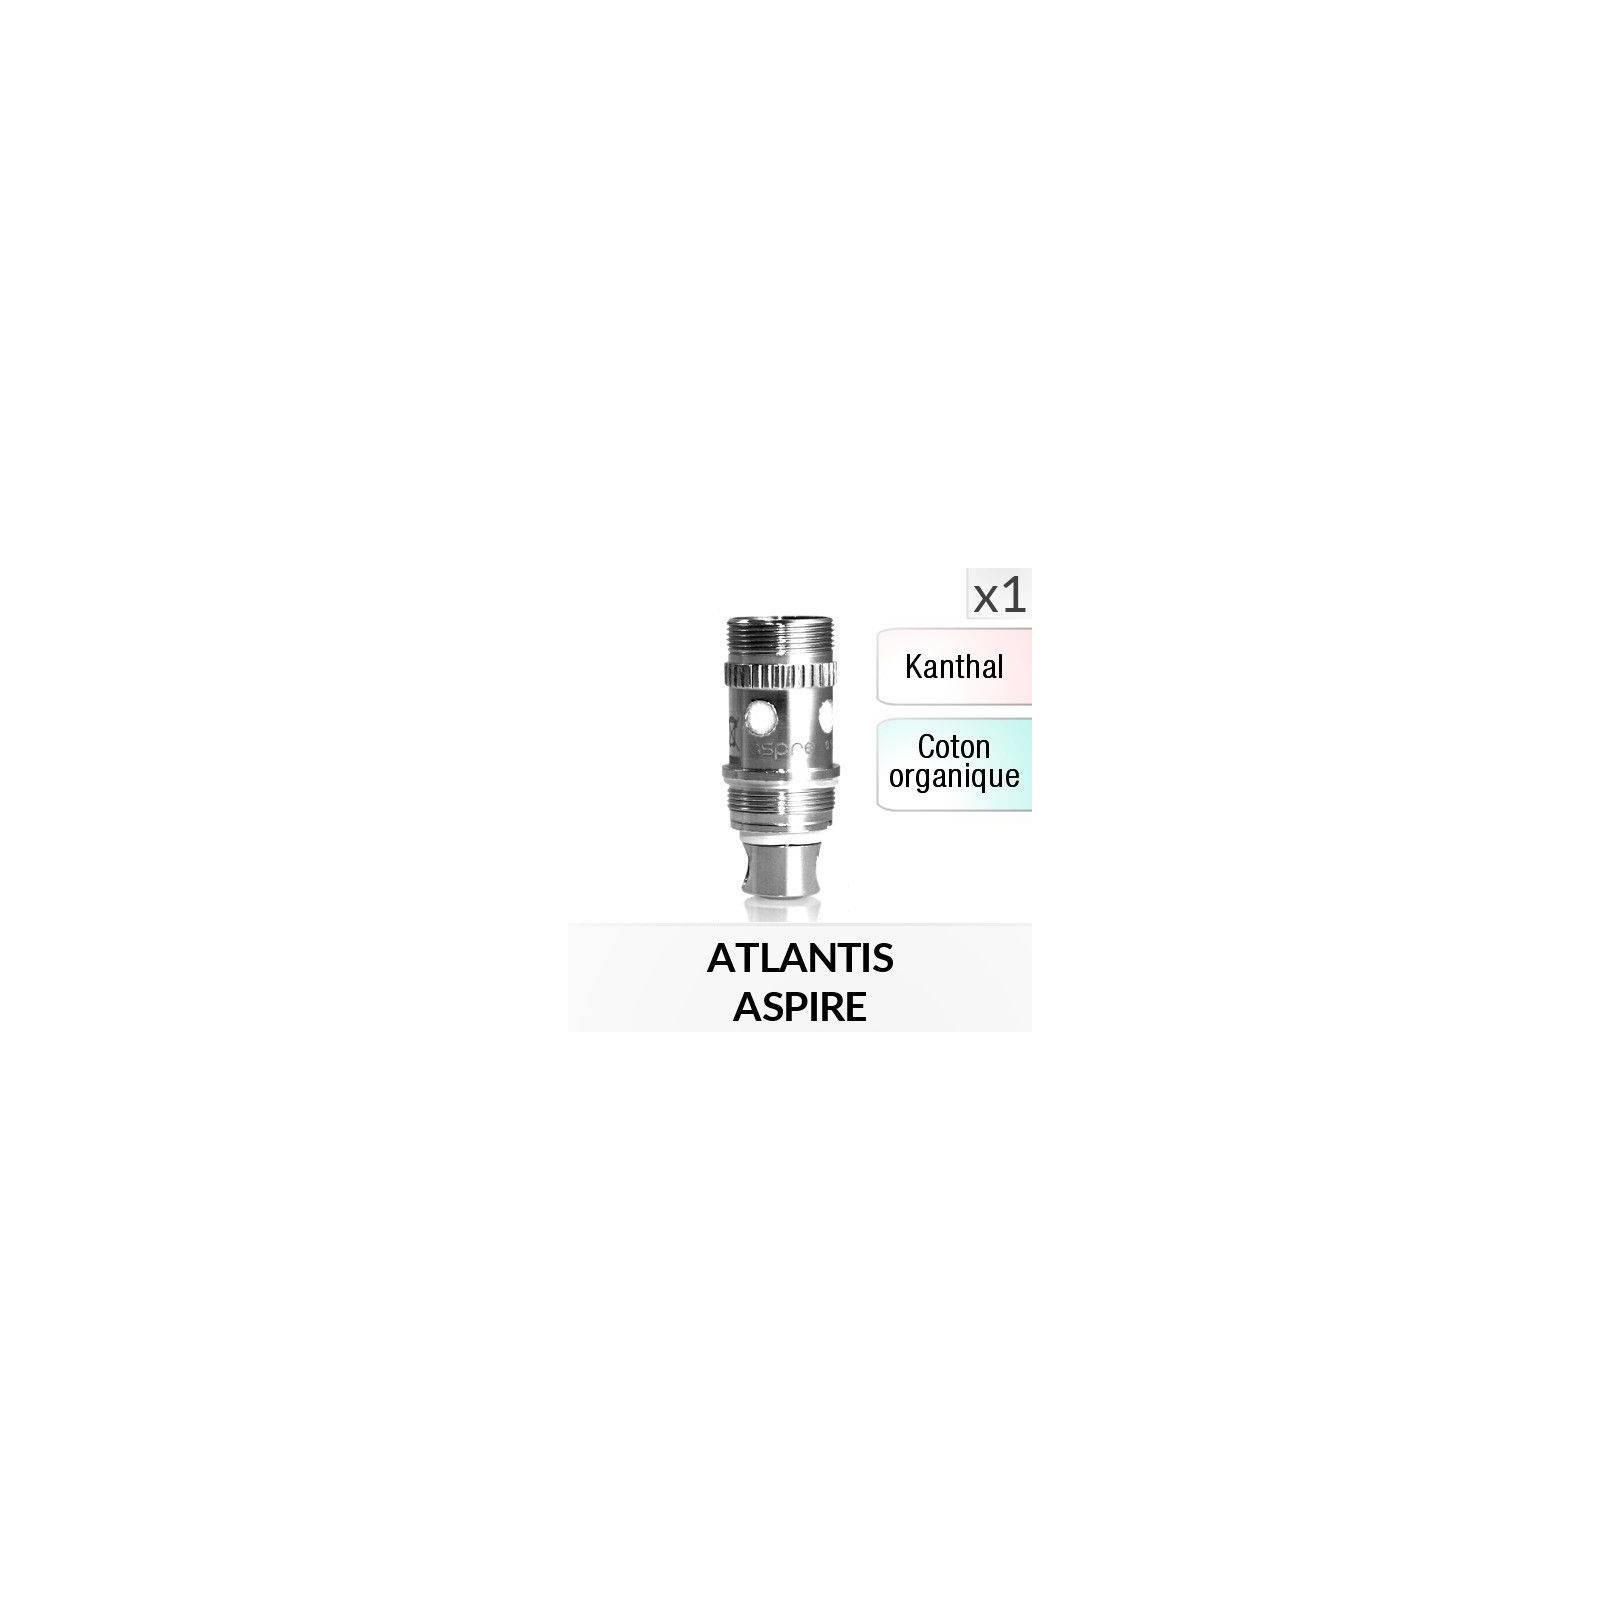 Résistance Atlantis Aspire - 1 pièce - ASPIRE